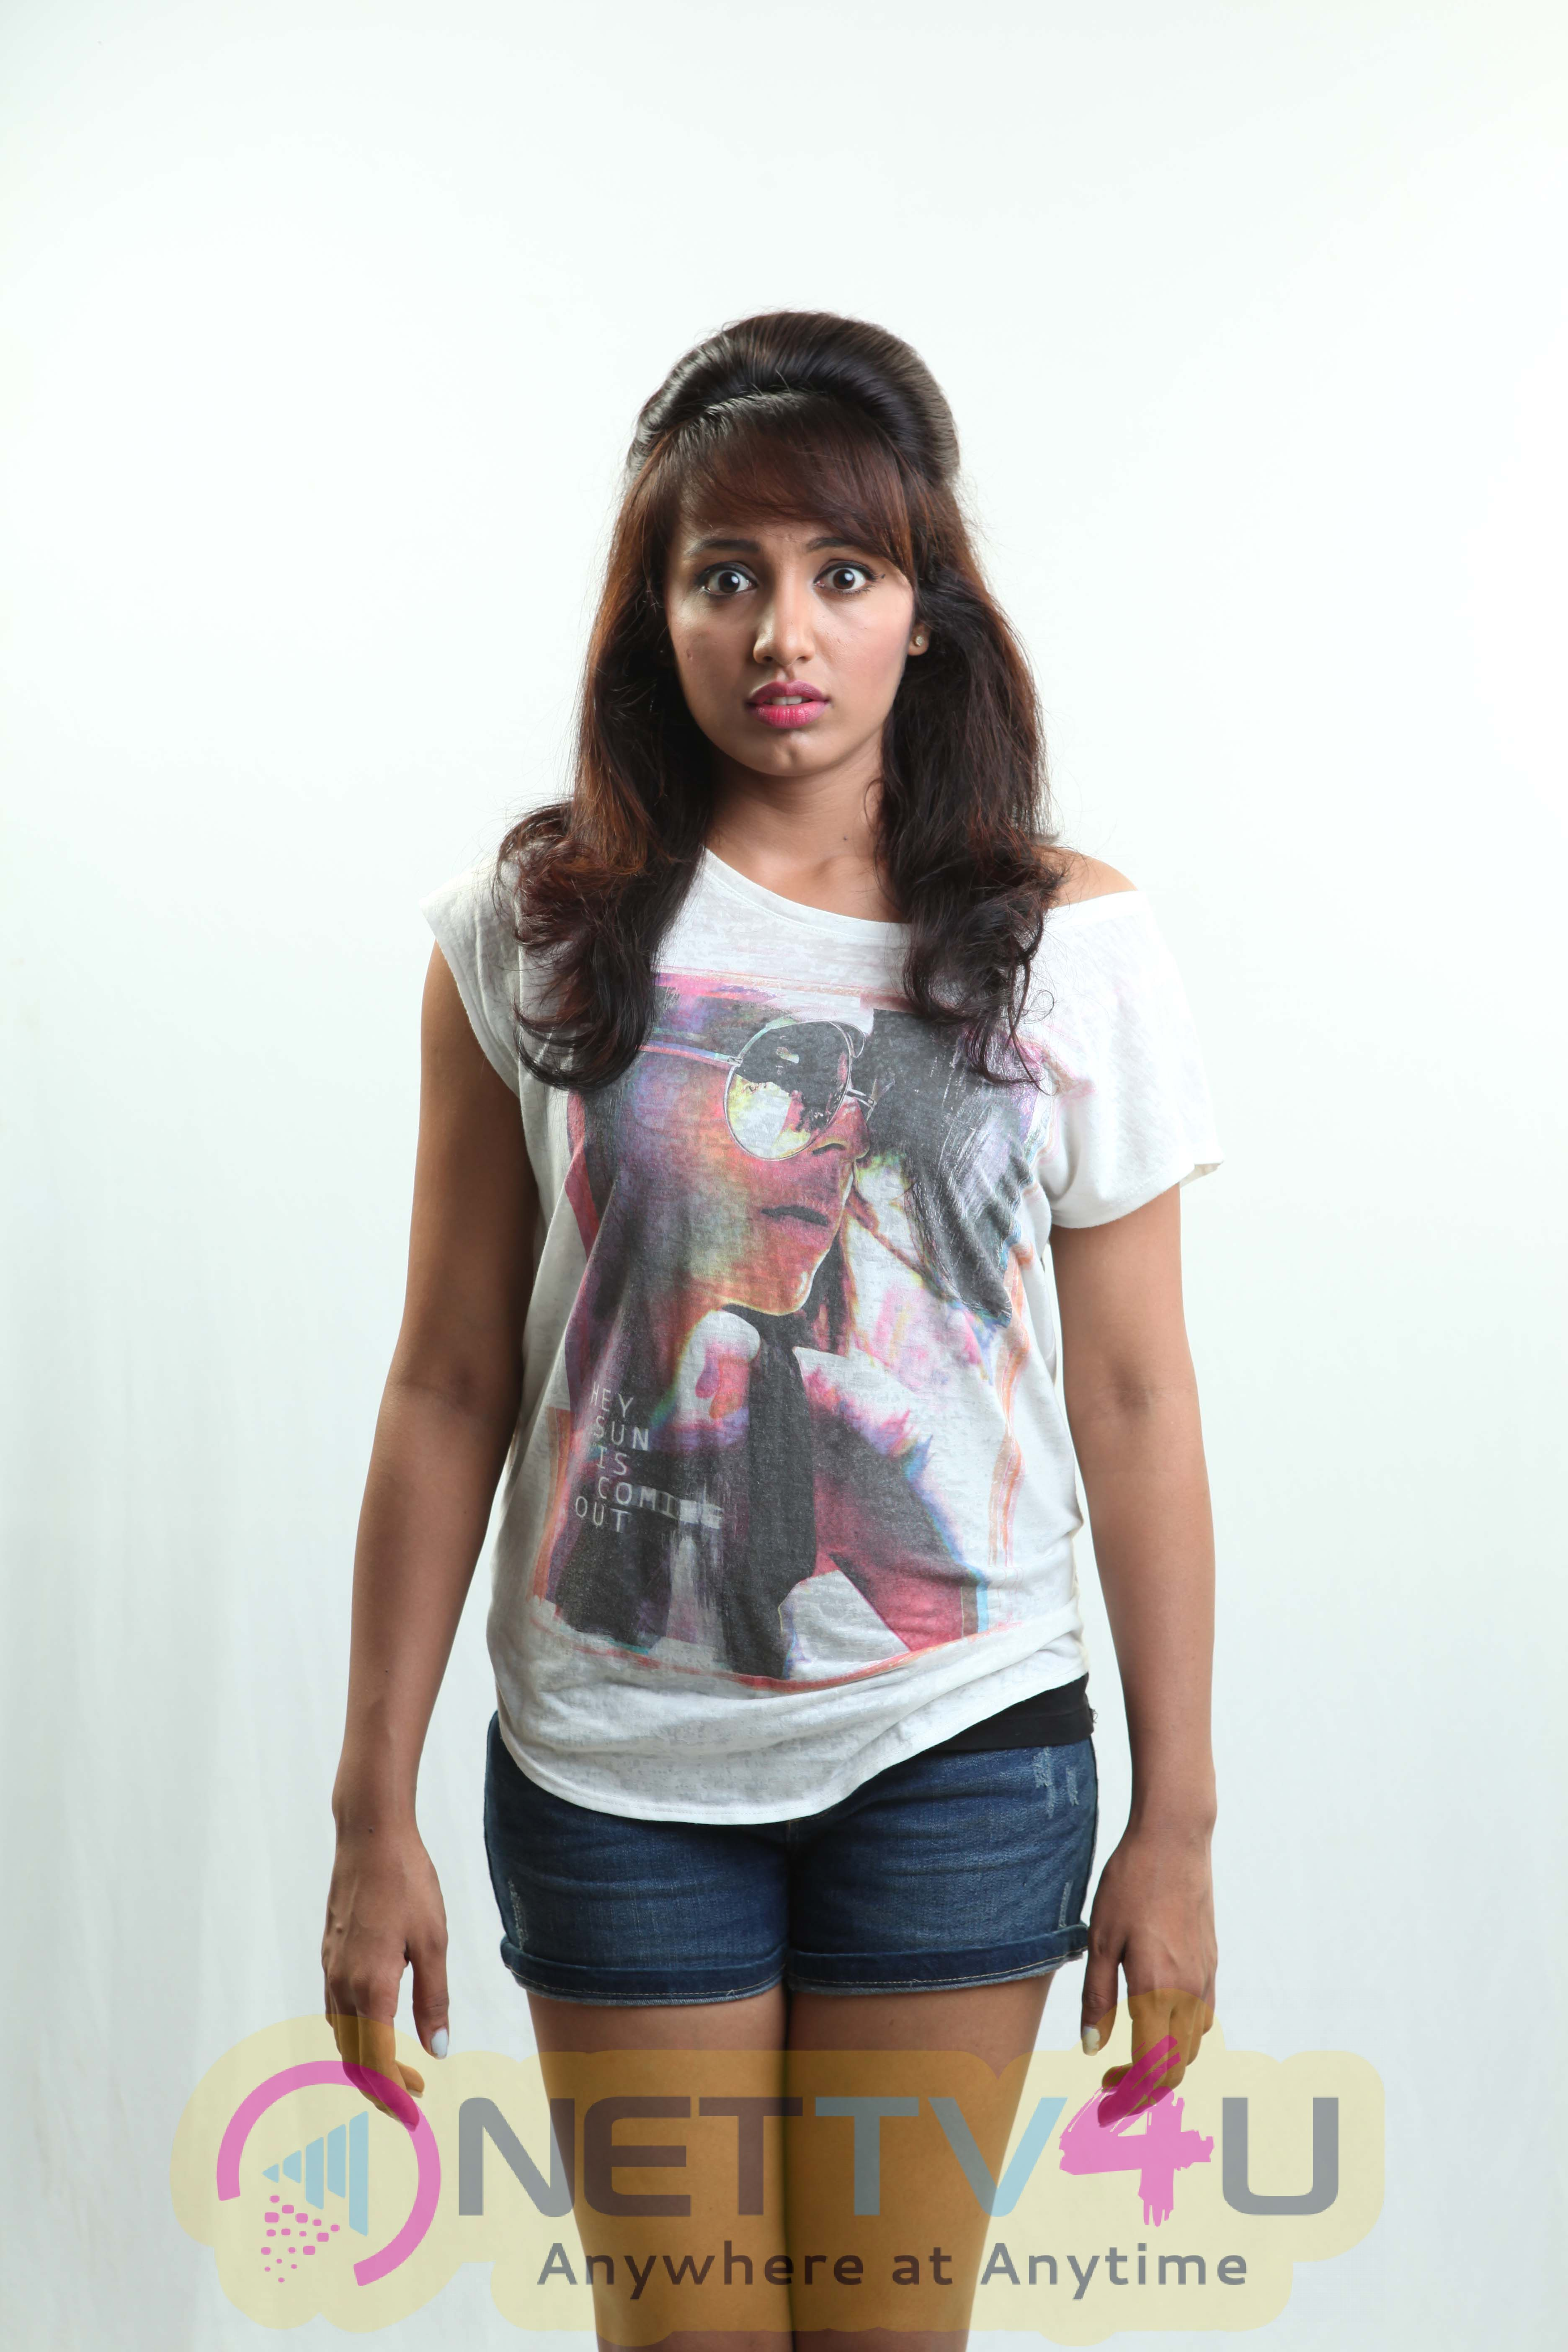 Choco Bar Tamil Movie First Look Gallerys